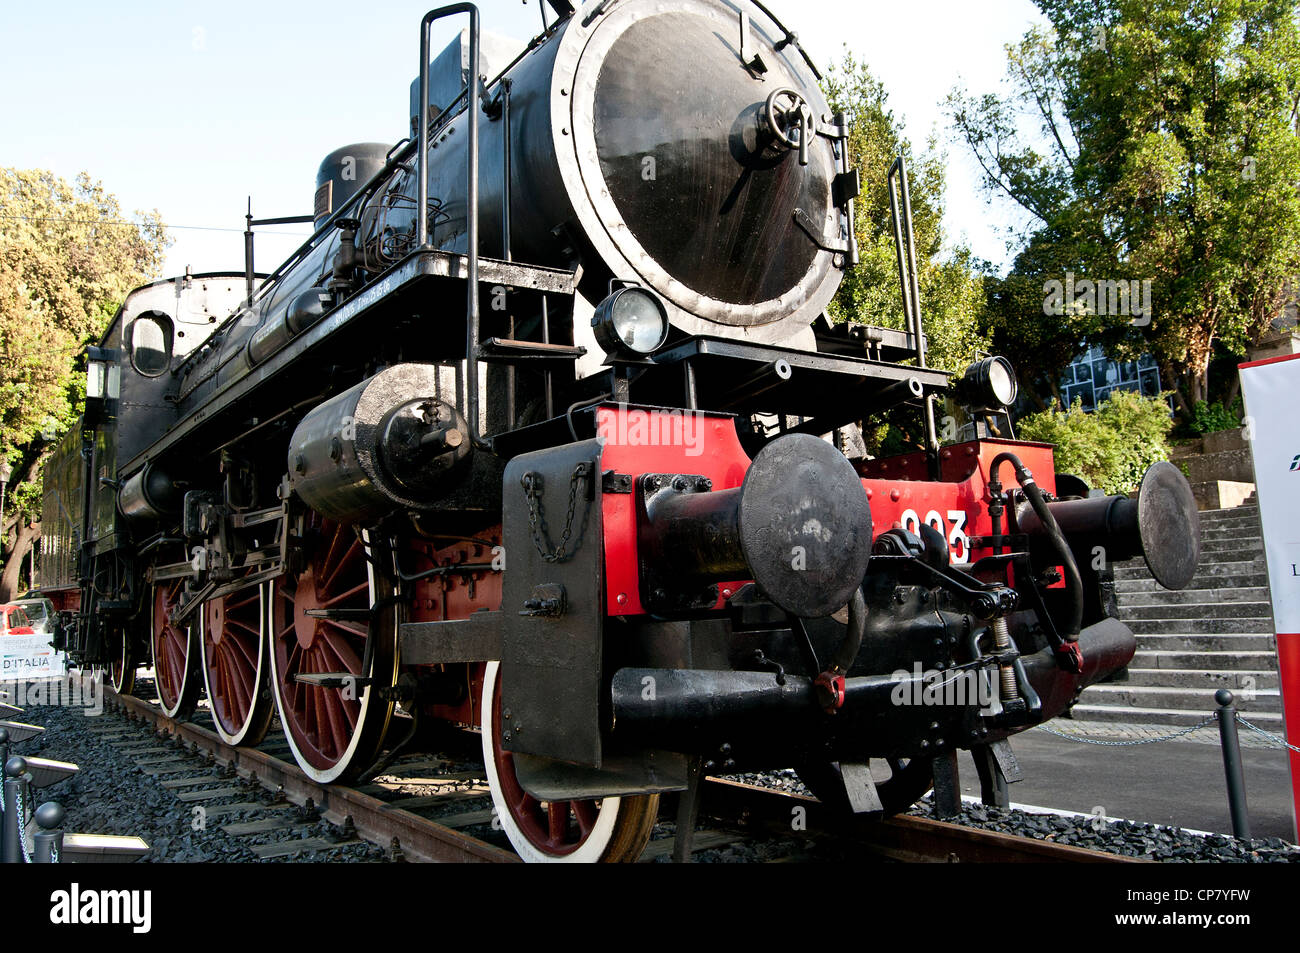 Vintage steam locomotive - Stock Image